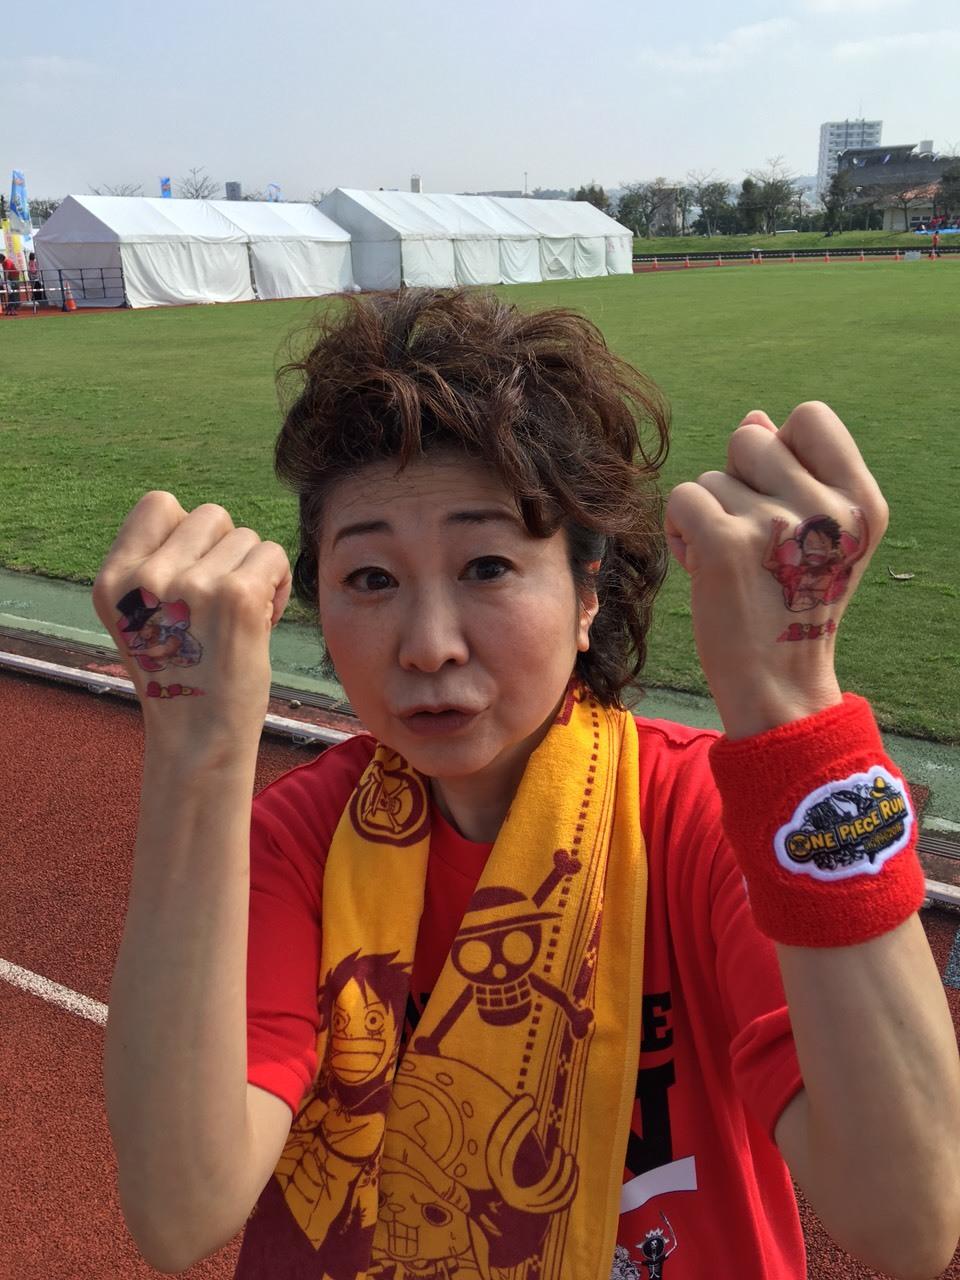 ONE PIECE RUN in 沖縄2016_a0163623_21122536.jpg